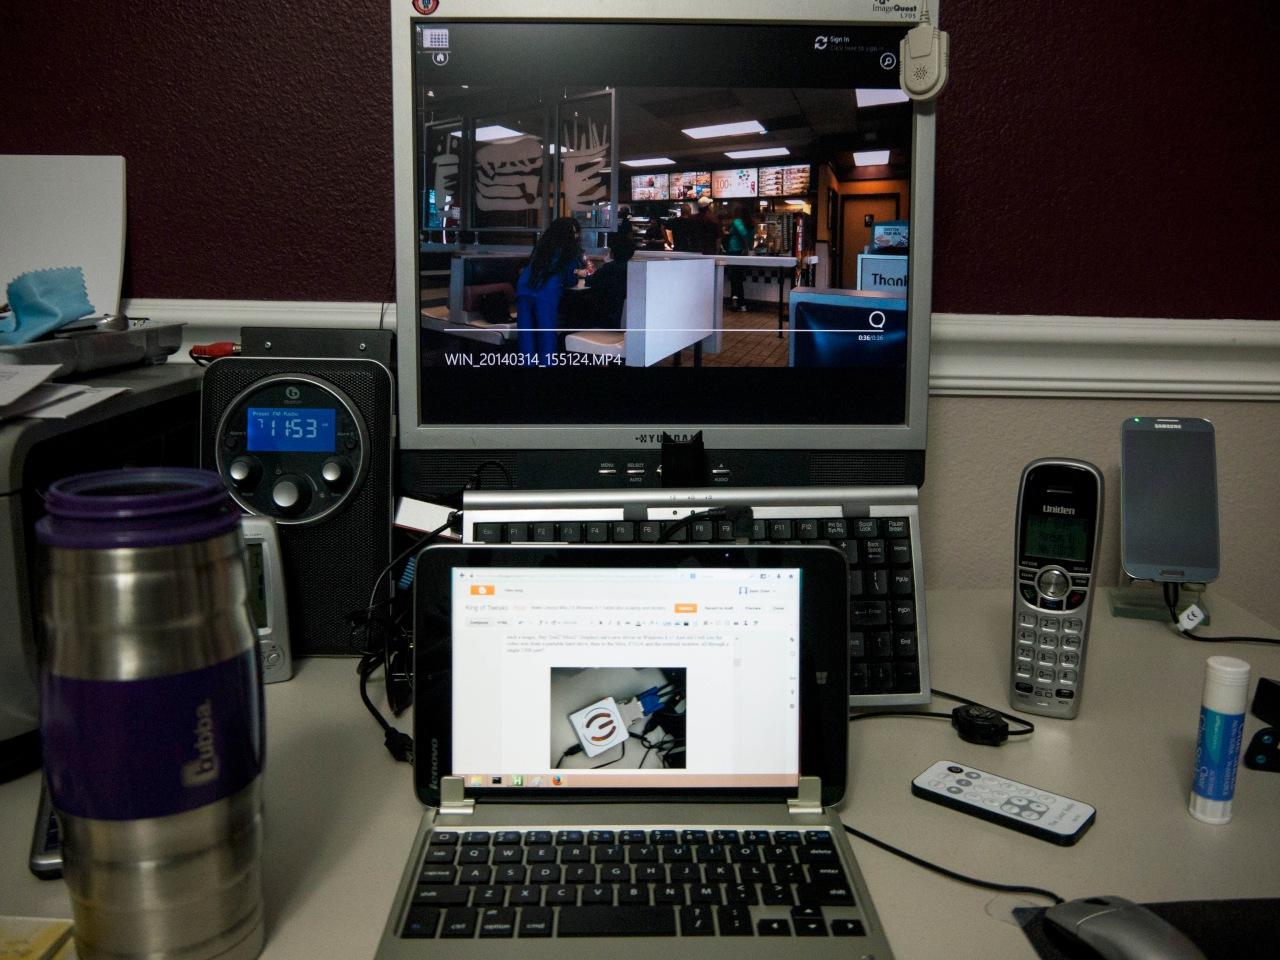 King of Tweaks: Make Lenovo Miix 2 8 Windows 8 1 Tablet also